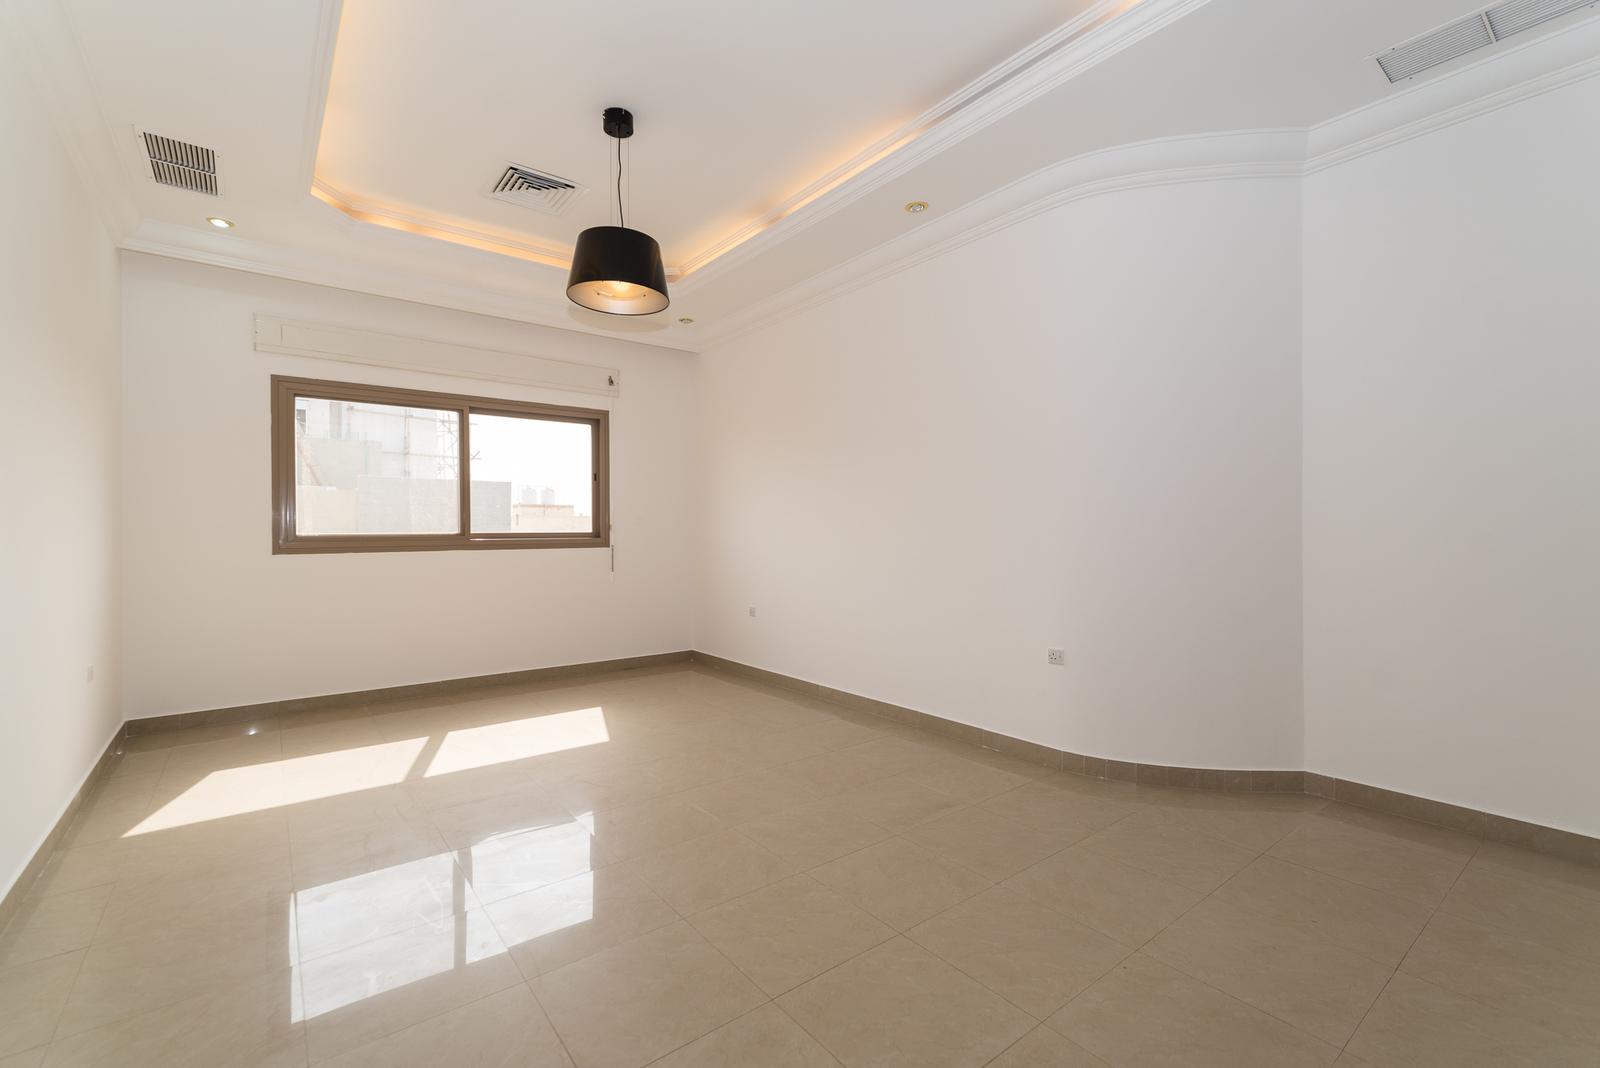 Salwa – spacious, unfurnished, three bedroom apartment